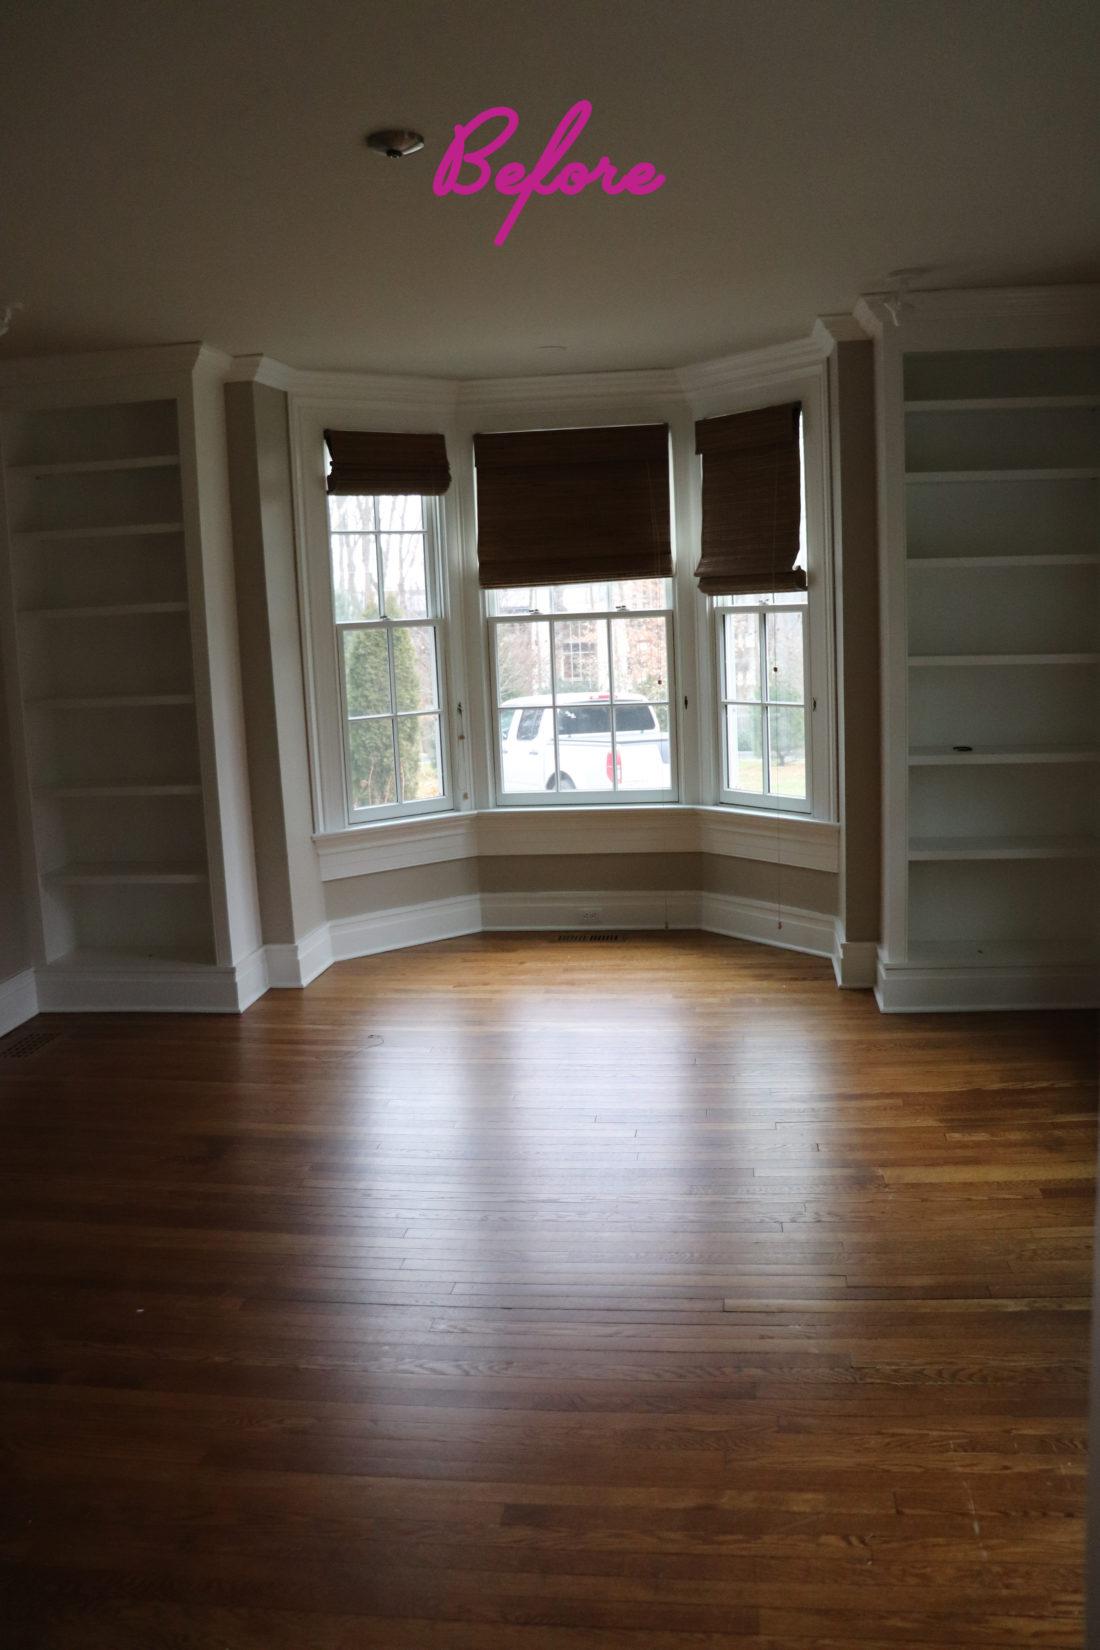 A 'before' image of the playroom inside Eva Amurri Martino's Westport CT home